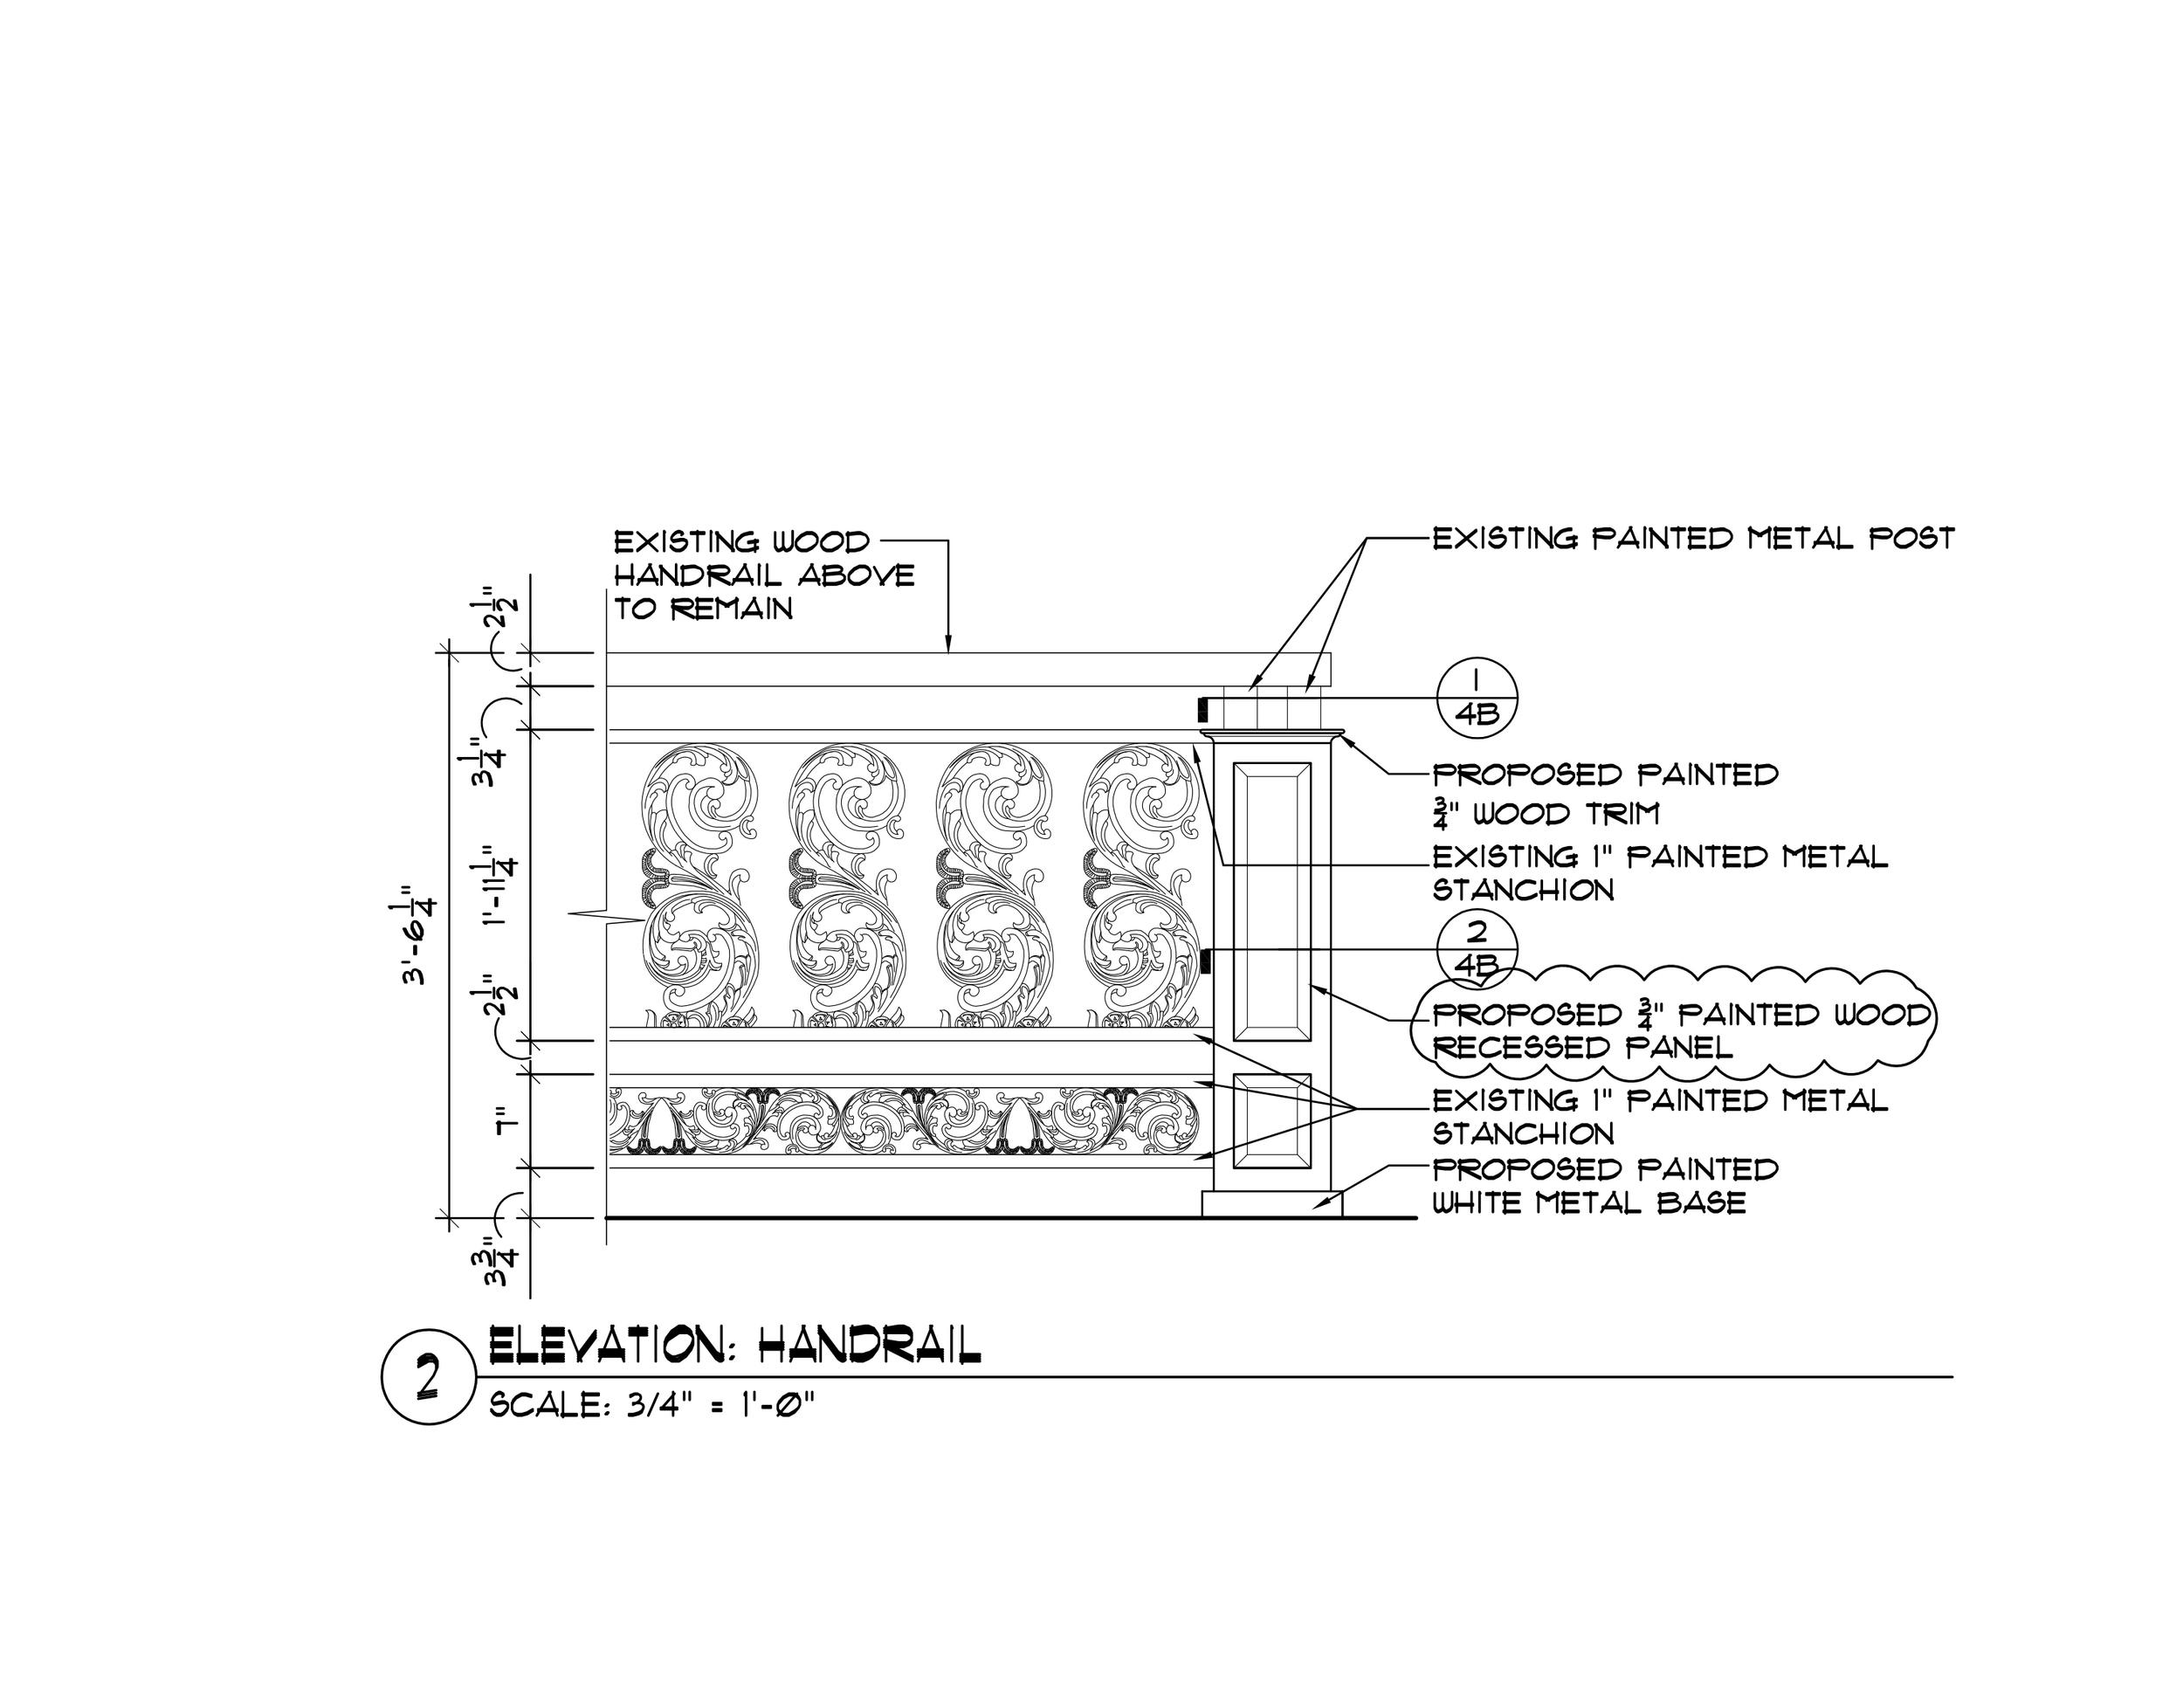 handrail elevations.jpg